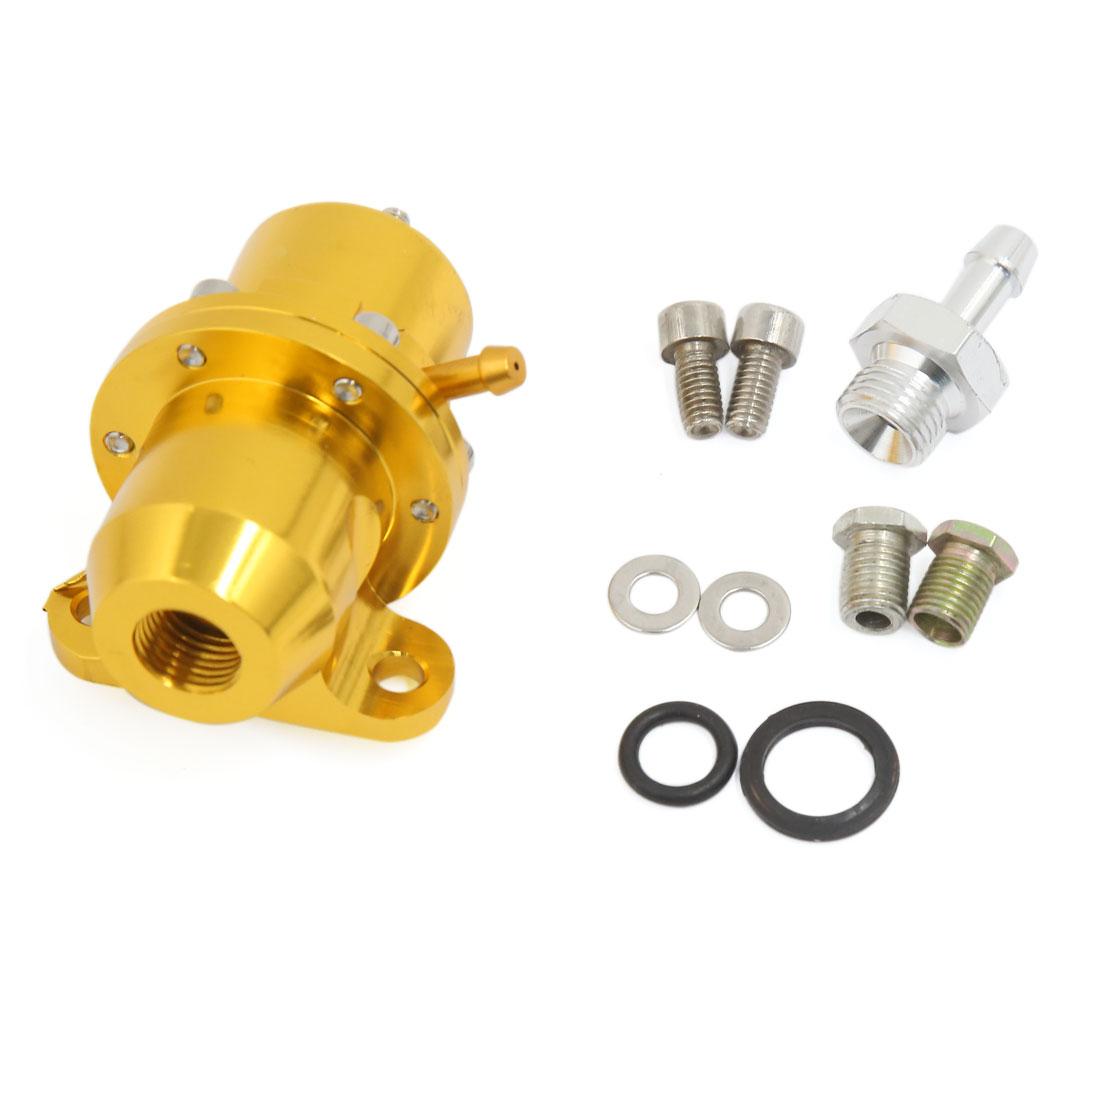 Universal Straight Metal 1:1 Ratio Adjustable Fuel Pressure Regulator Gold Tone for Car